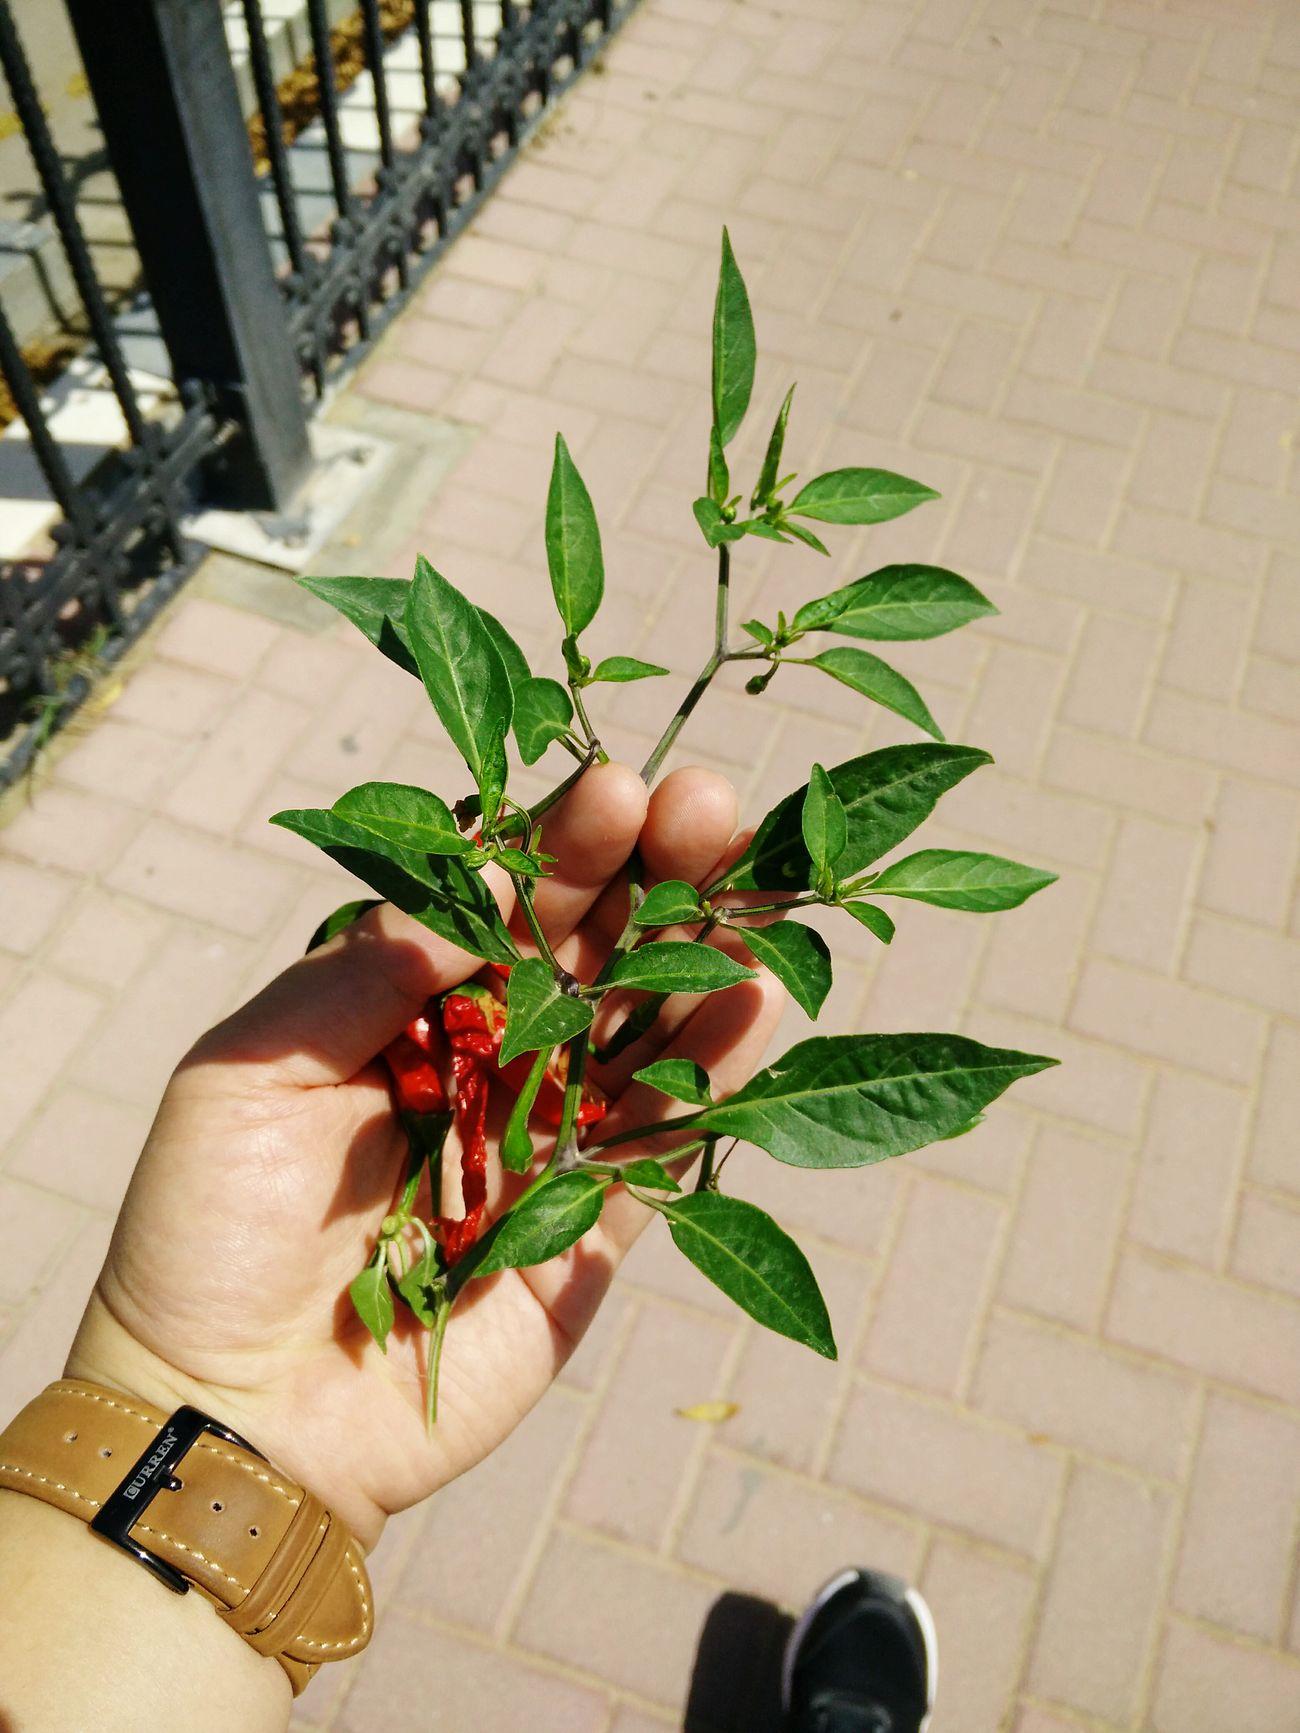 It's Hot in here 🌋😎🔥 Summer Vibes Humidity Dessertstory Dubai Uaegram Ilovenature Chili Plant Chilin' Chillies Hot Day HotChilli EyeEm Best Shots EyeEm Nature Lover